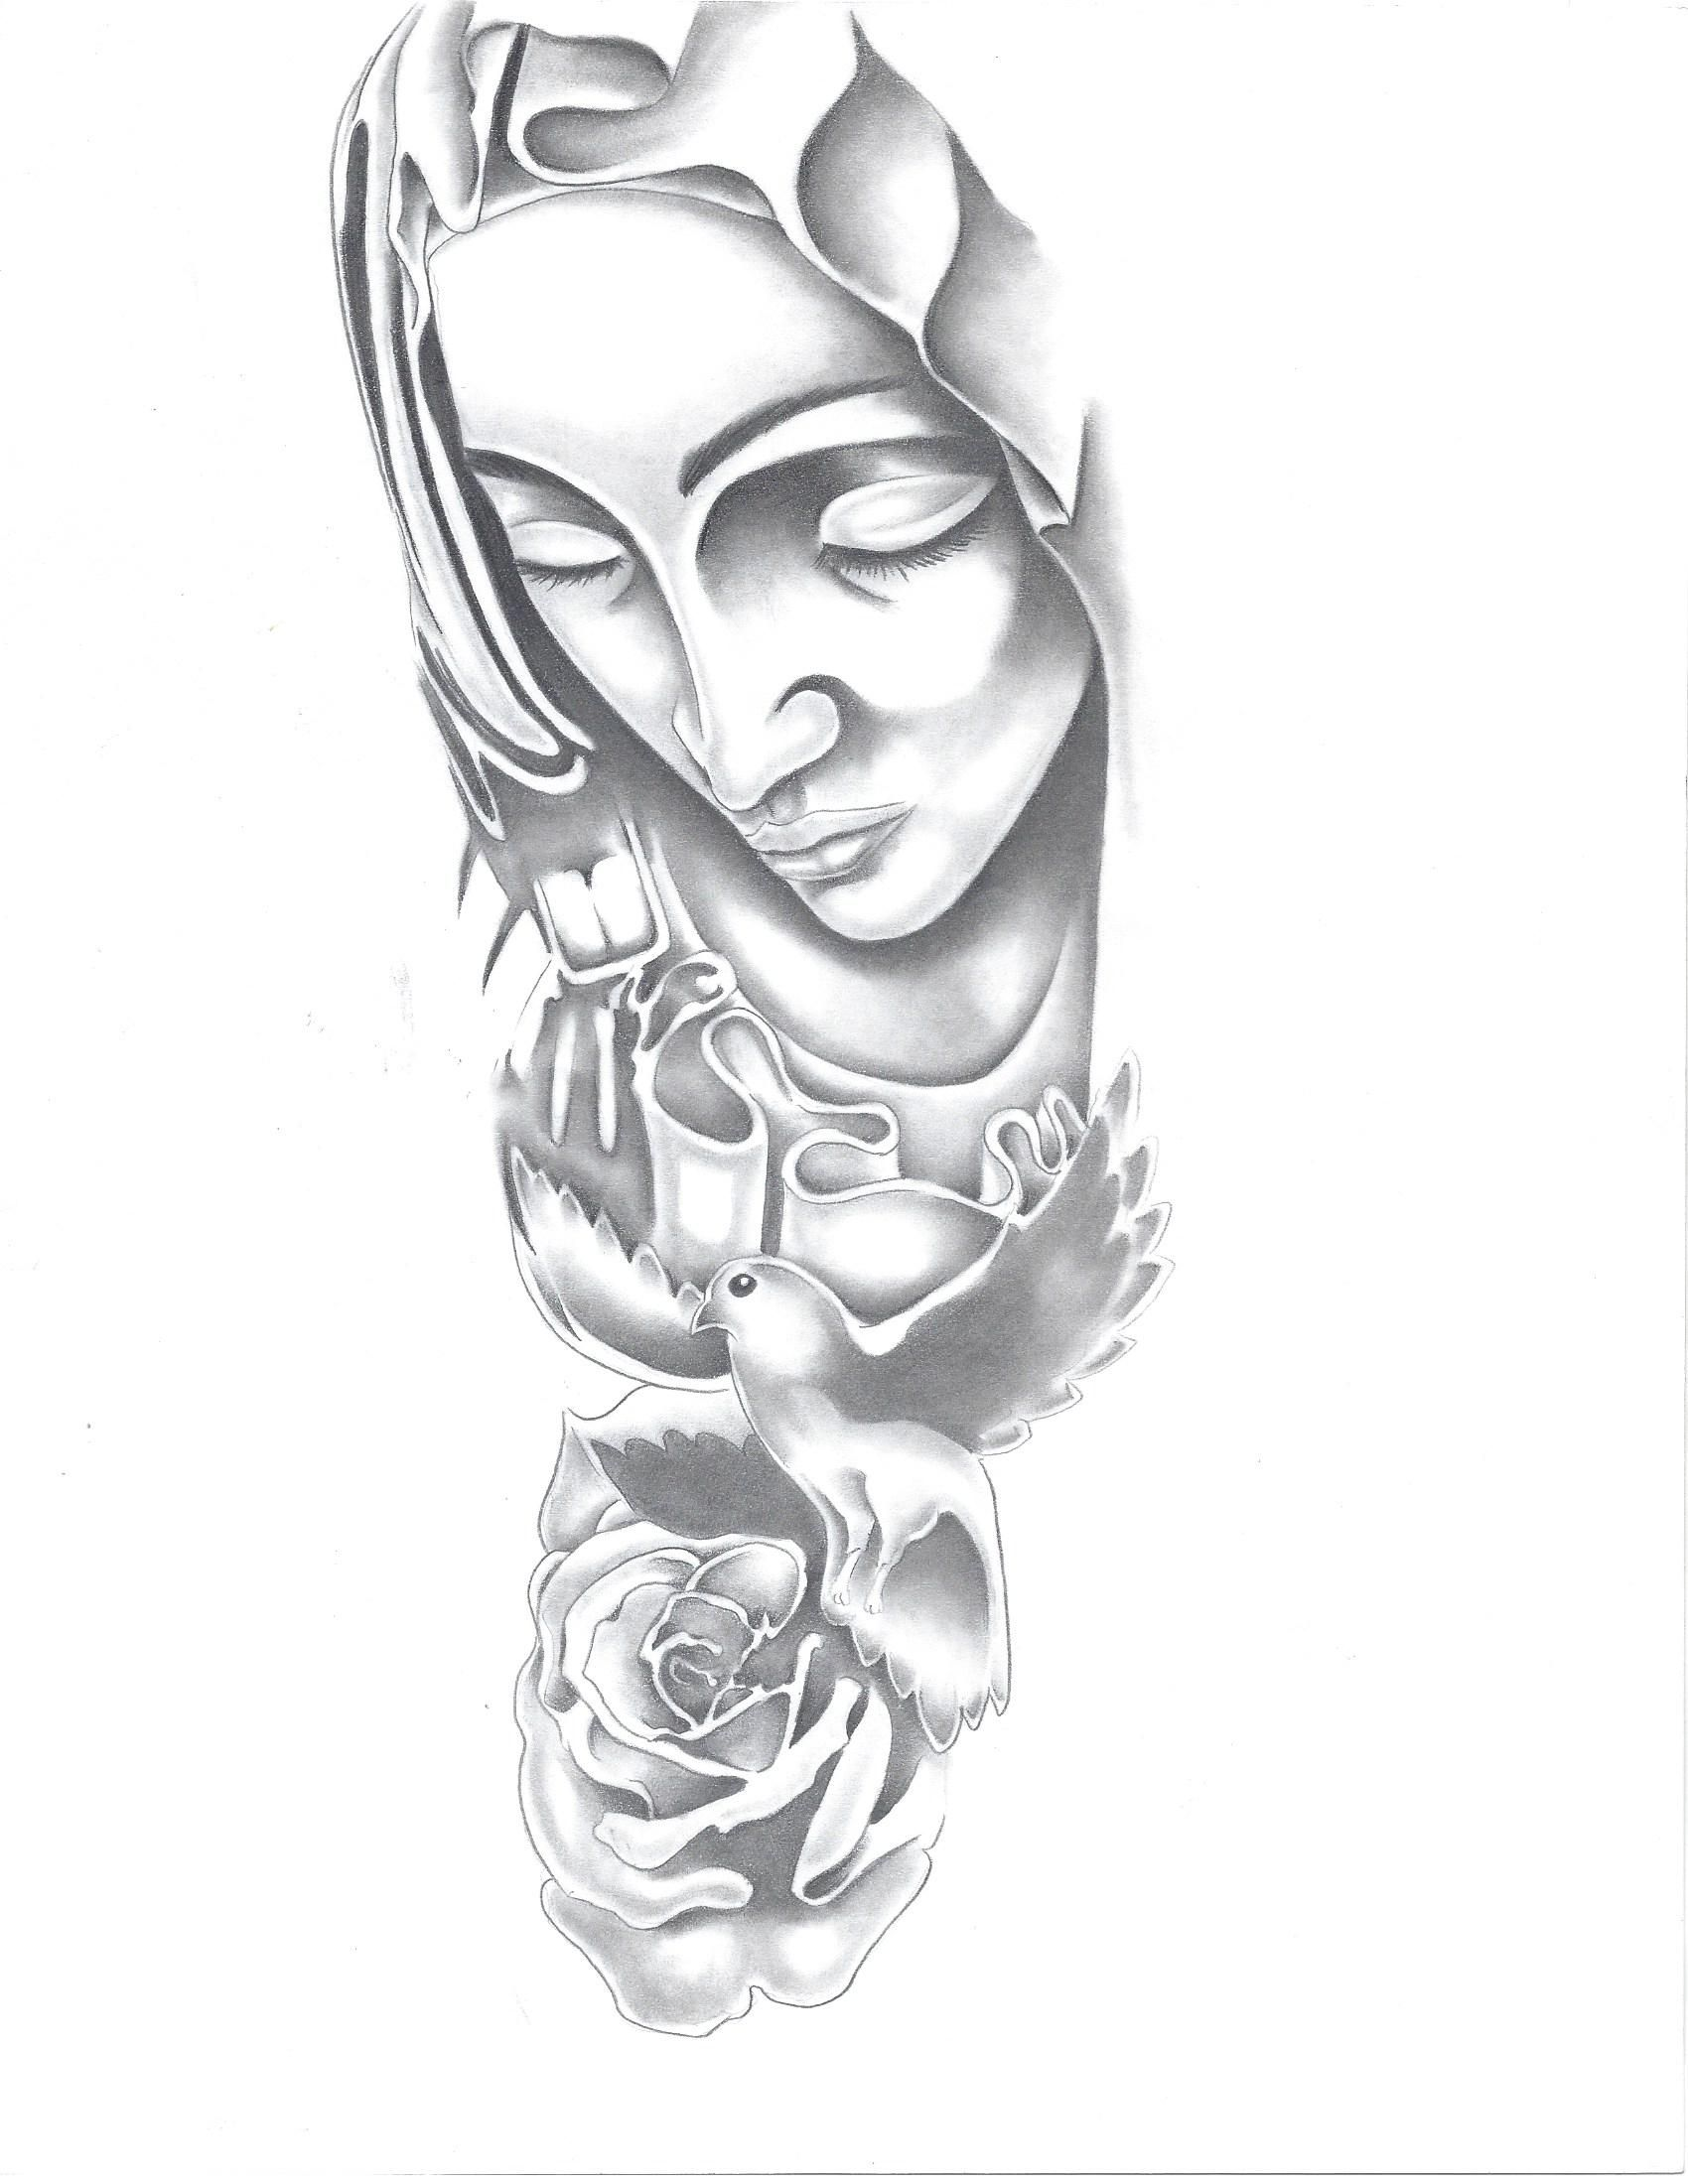 Pencil On Paper Tattoo Design Drawings Tattoos Forearm Sleeve Tattoos